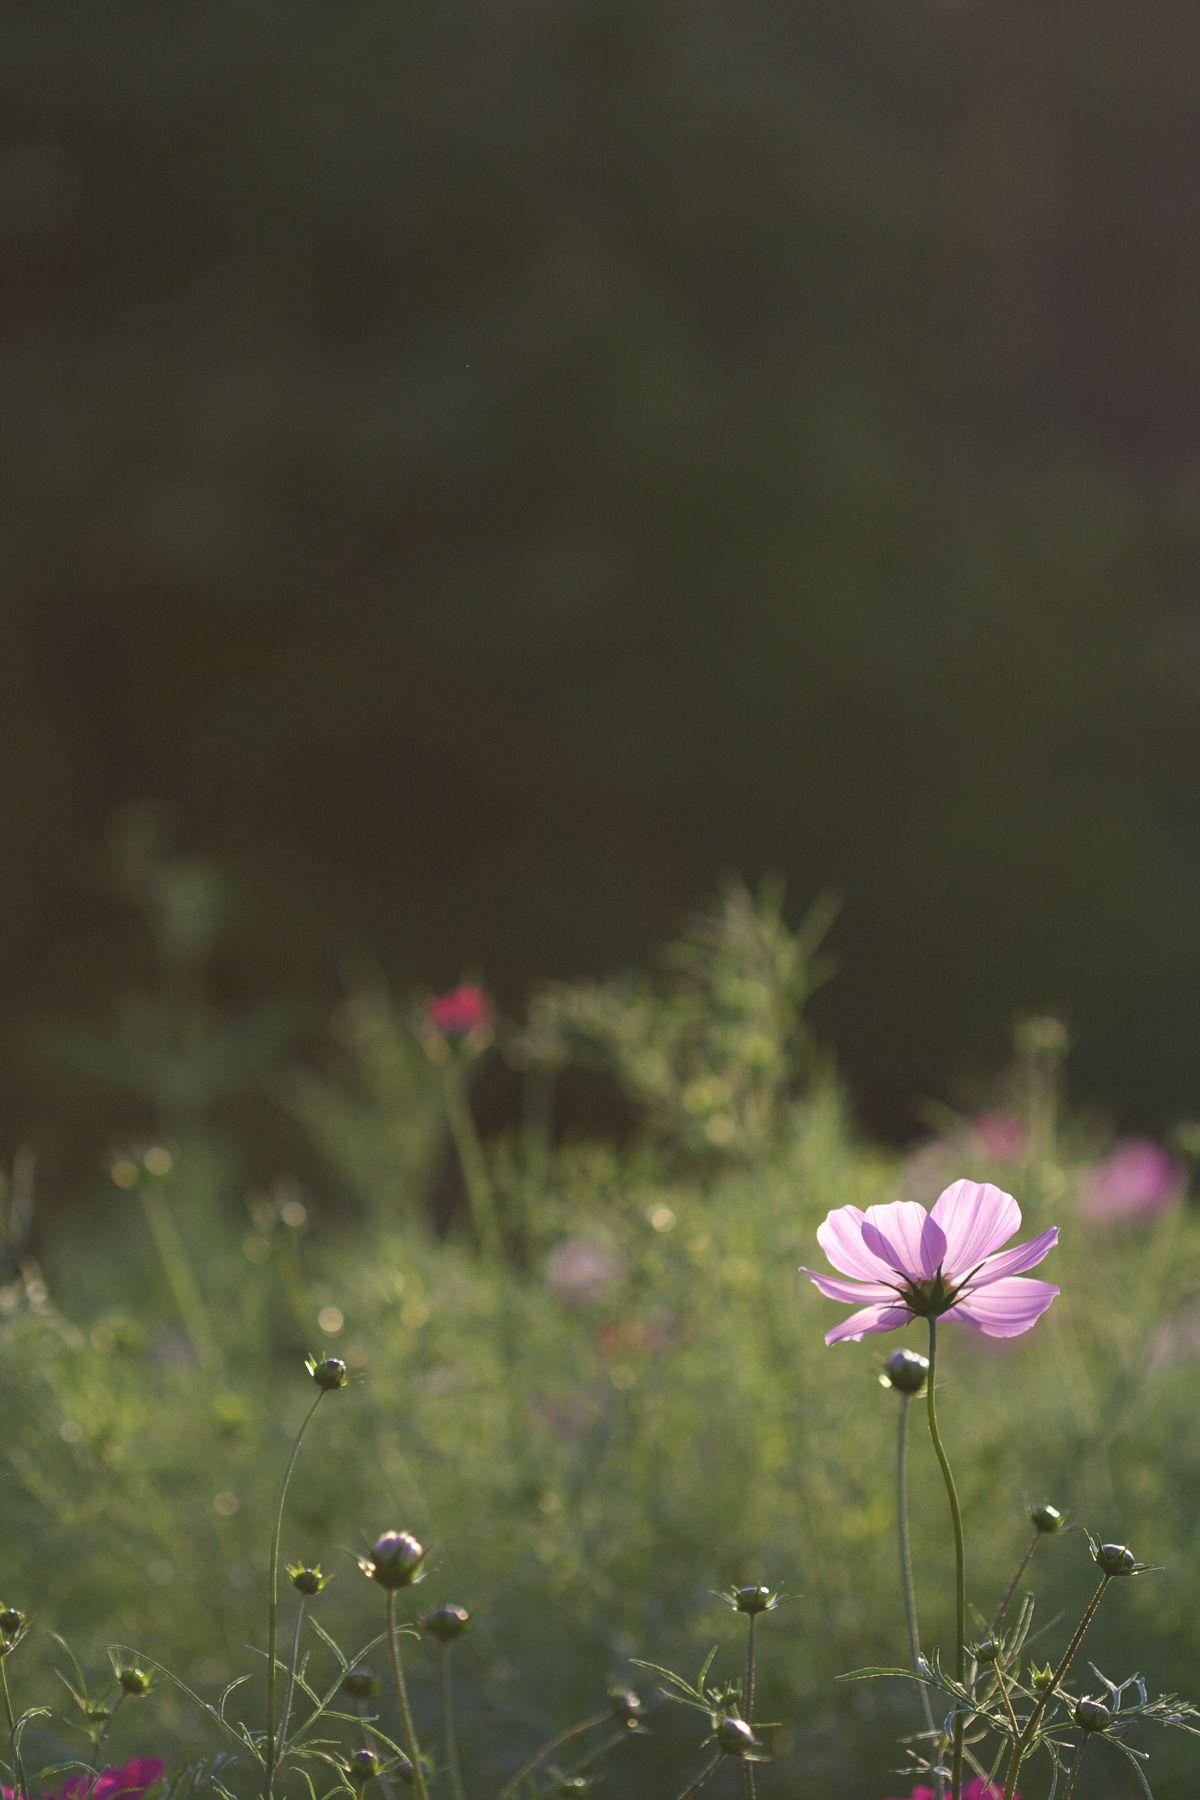 近所の秋桜_d0108063_22322319.jpg